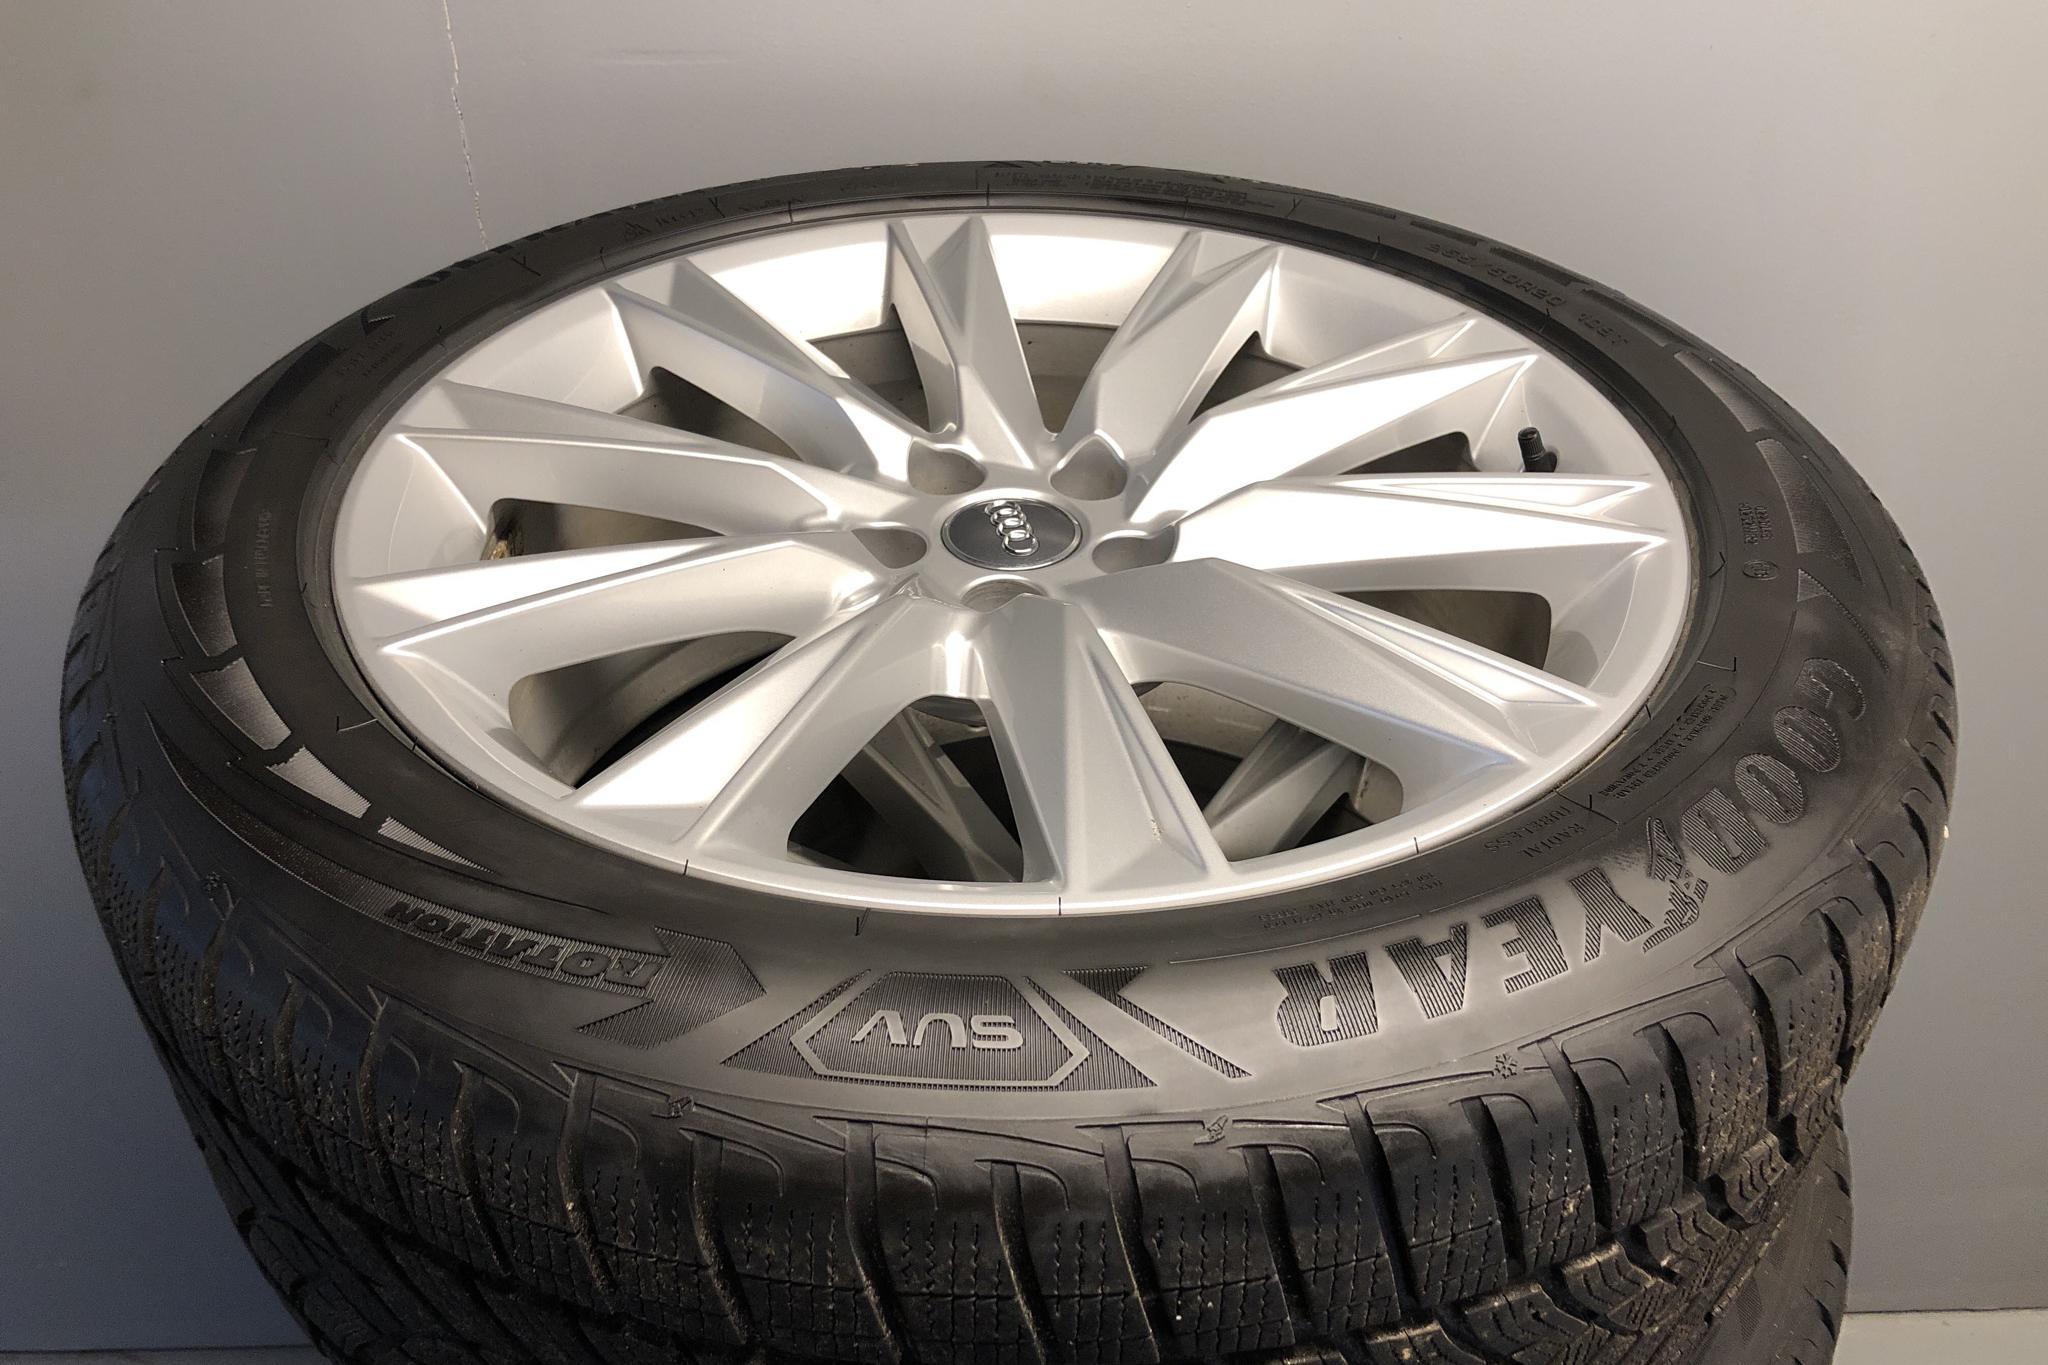 Audi e-tron 50 quattro 71 kWh (288hk) - 36 850 km - Automatic - black - 2020